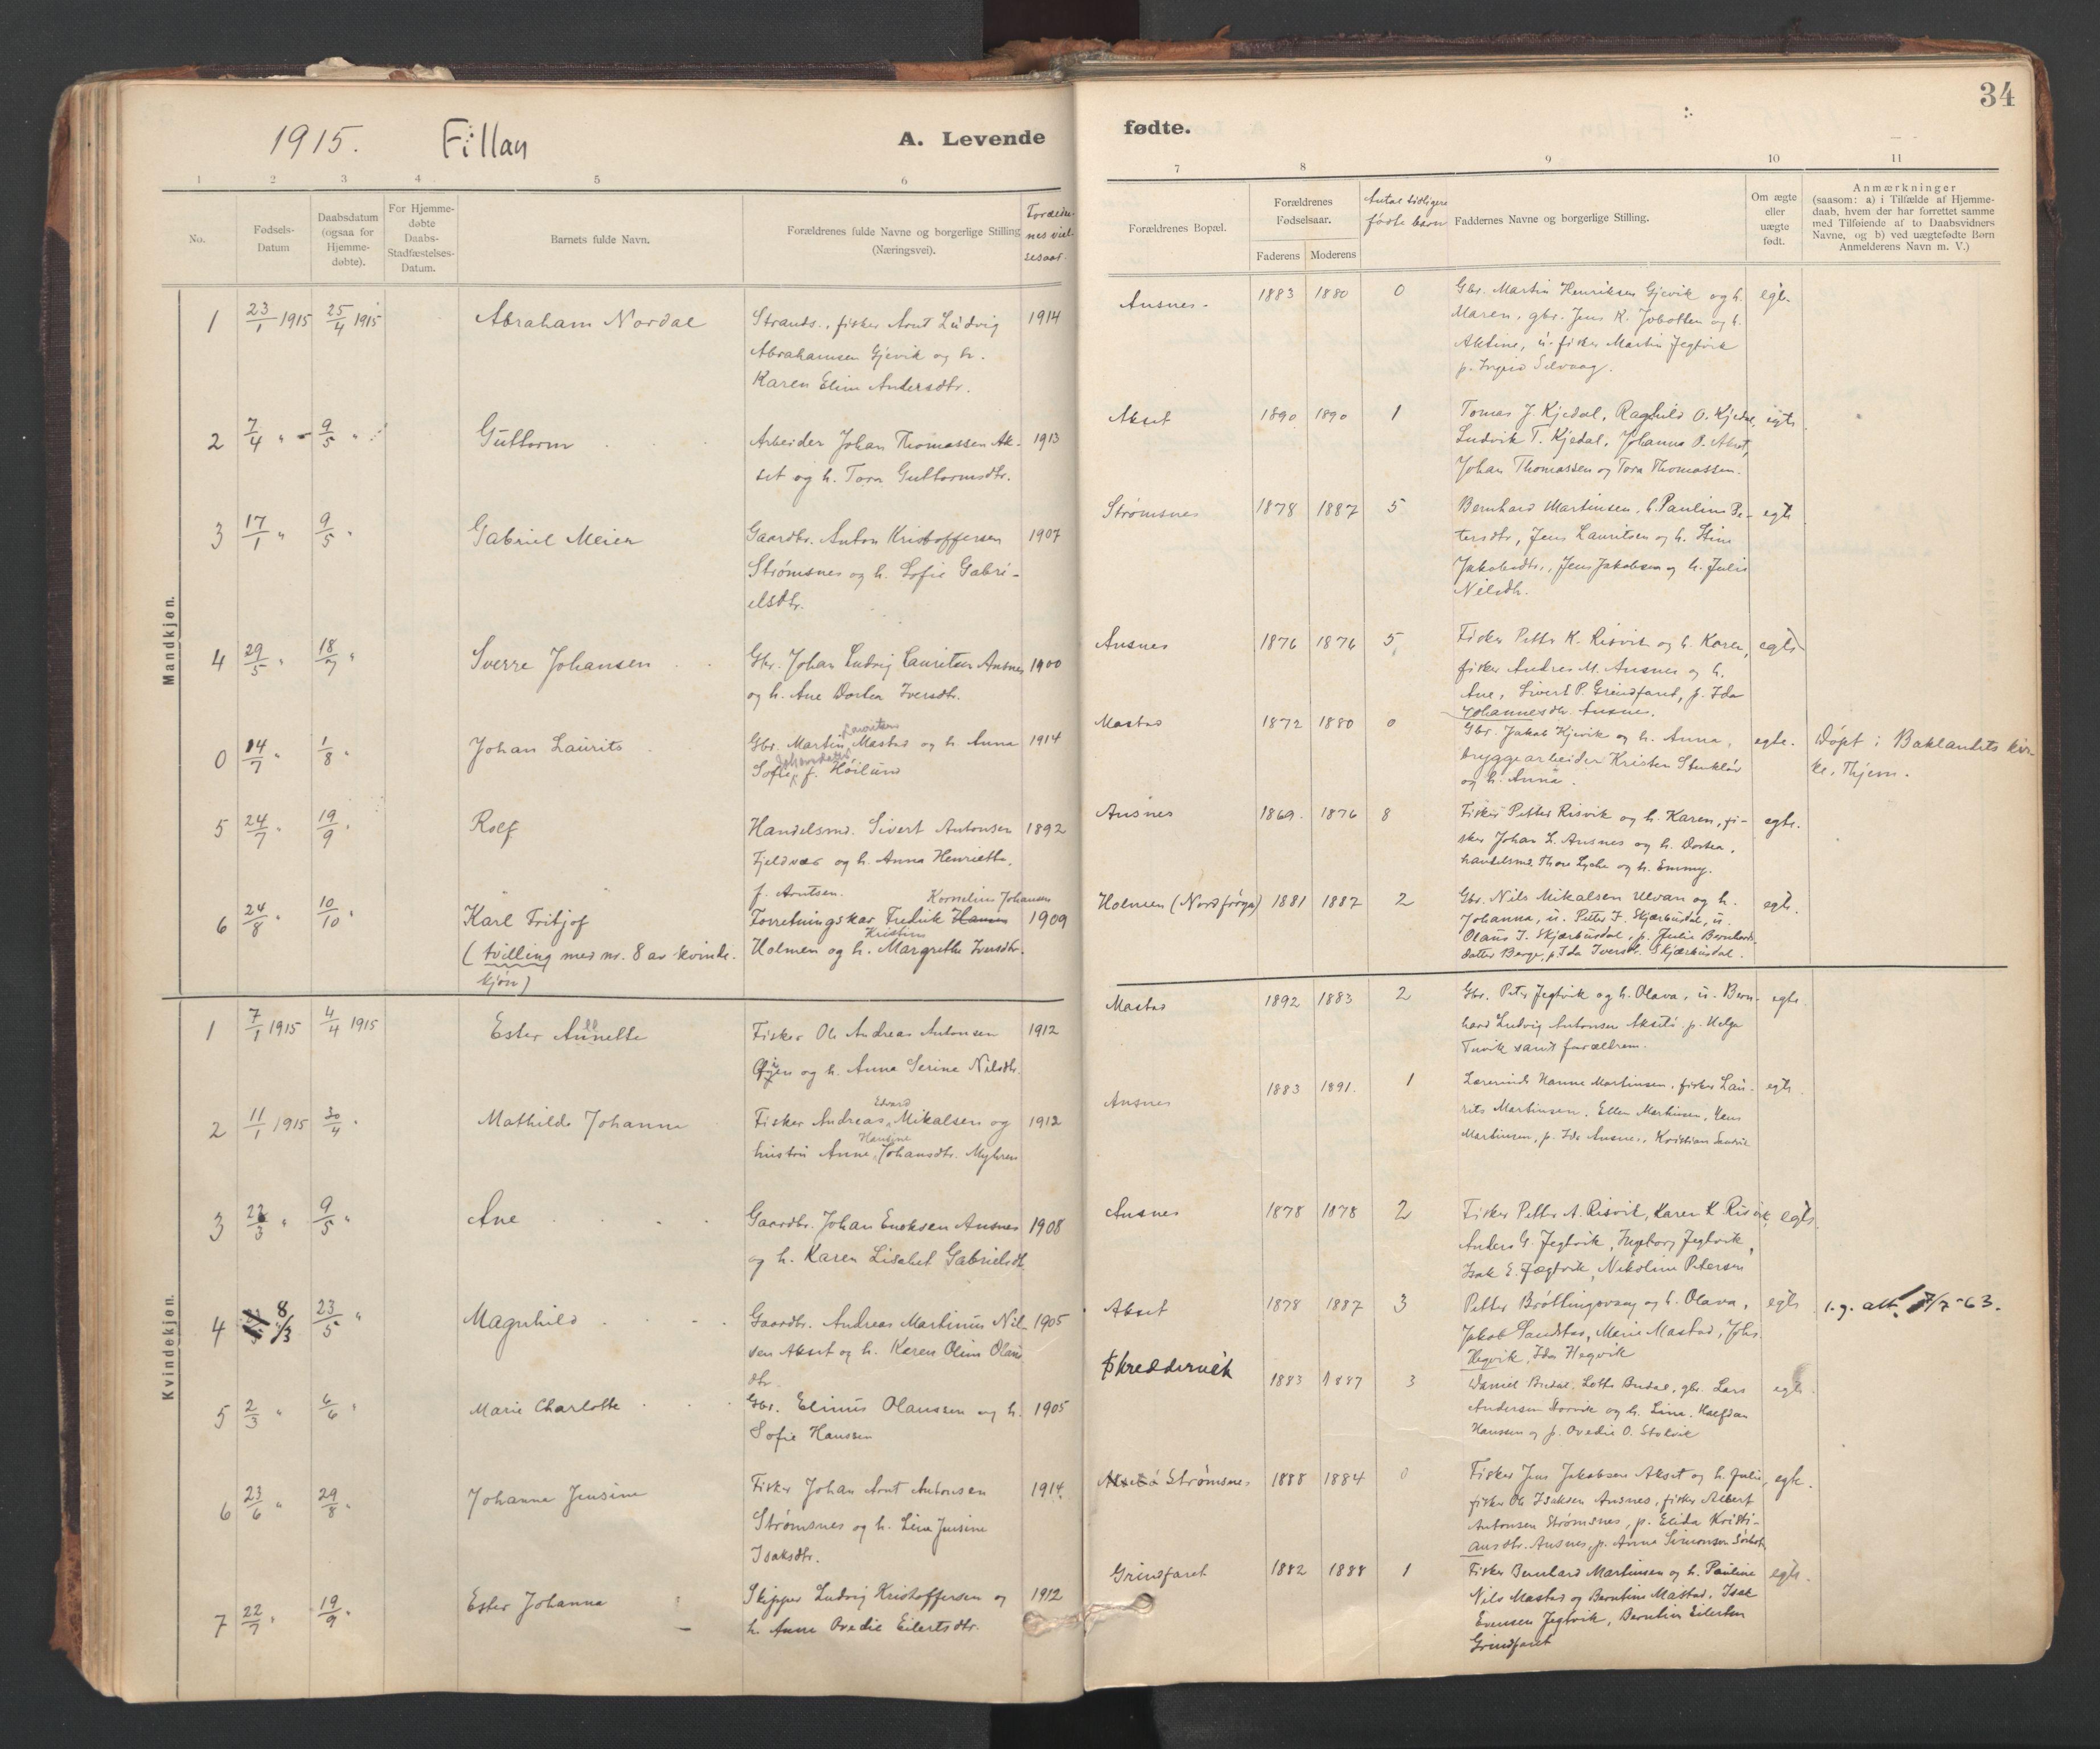 SAT, Ministerialprotokoller, klokkerbøker og fødselsregistre - Sør-Trøndelag, 637/L0559: Parish register (official) no. 637A02, 1899-1923, p. 34